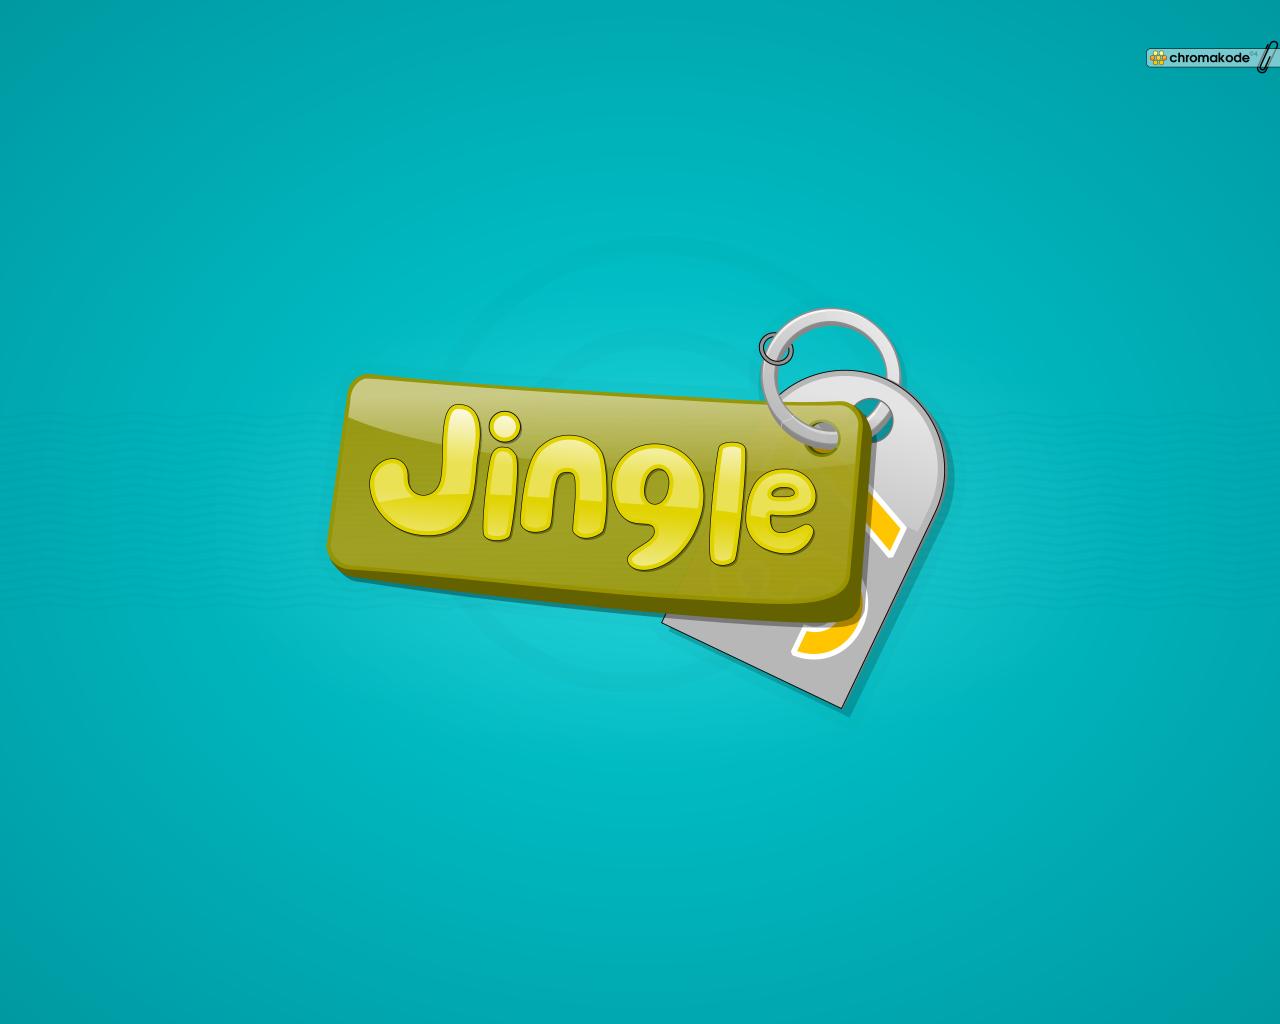 Jingle by Chromakode